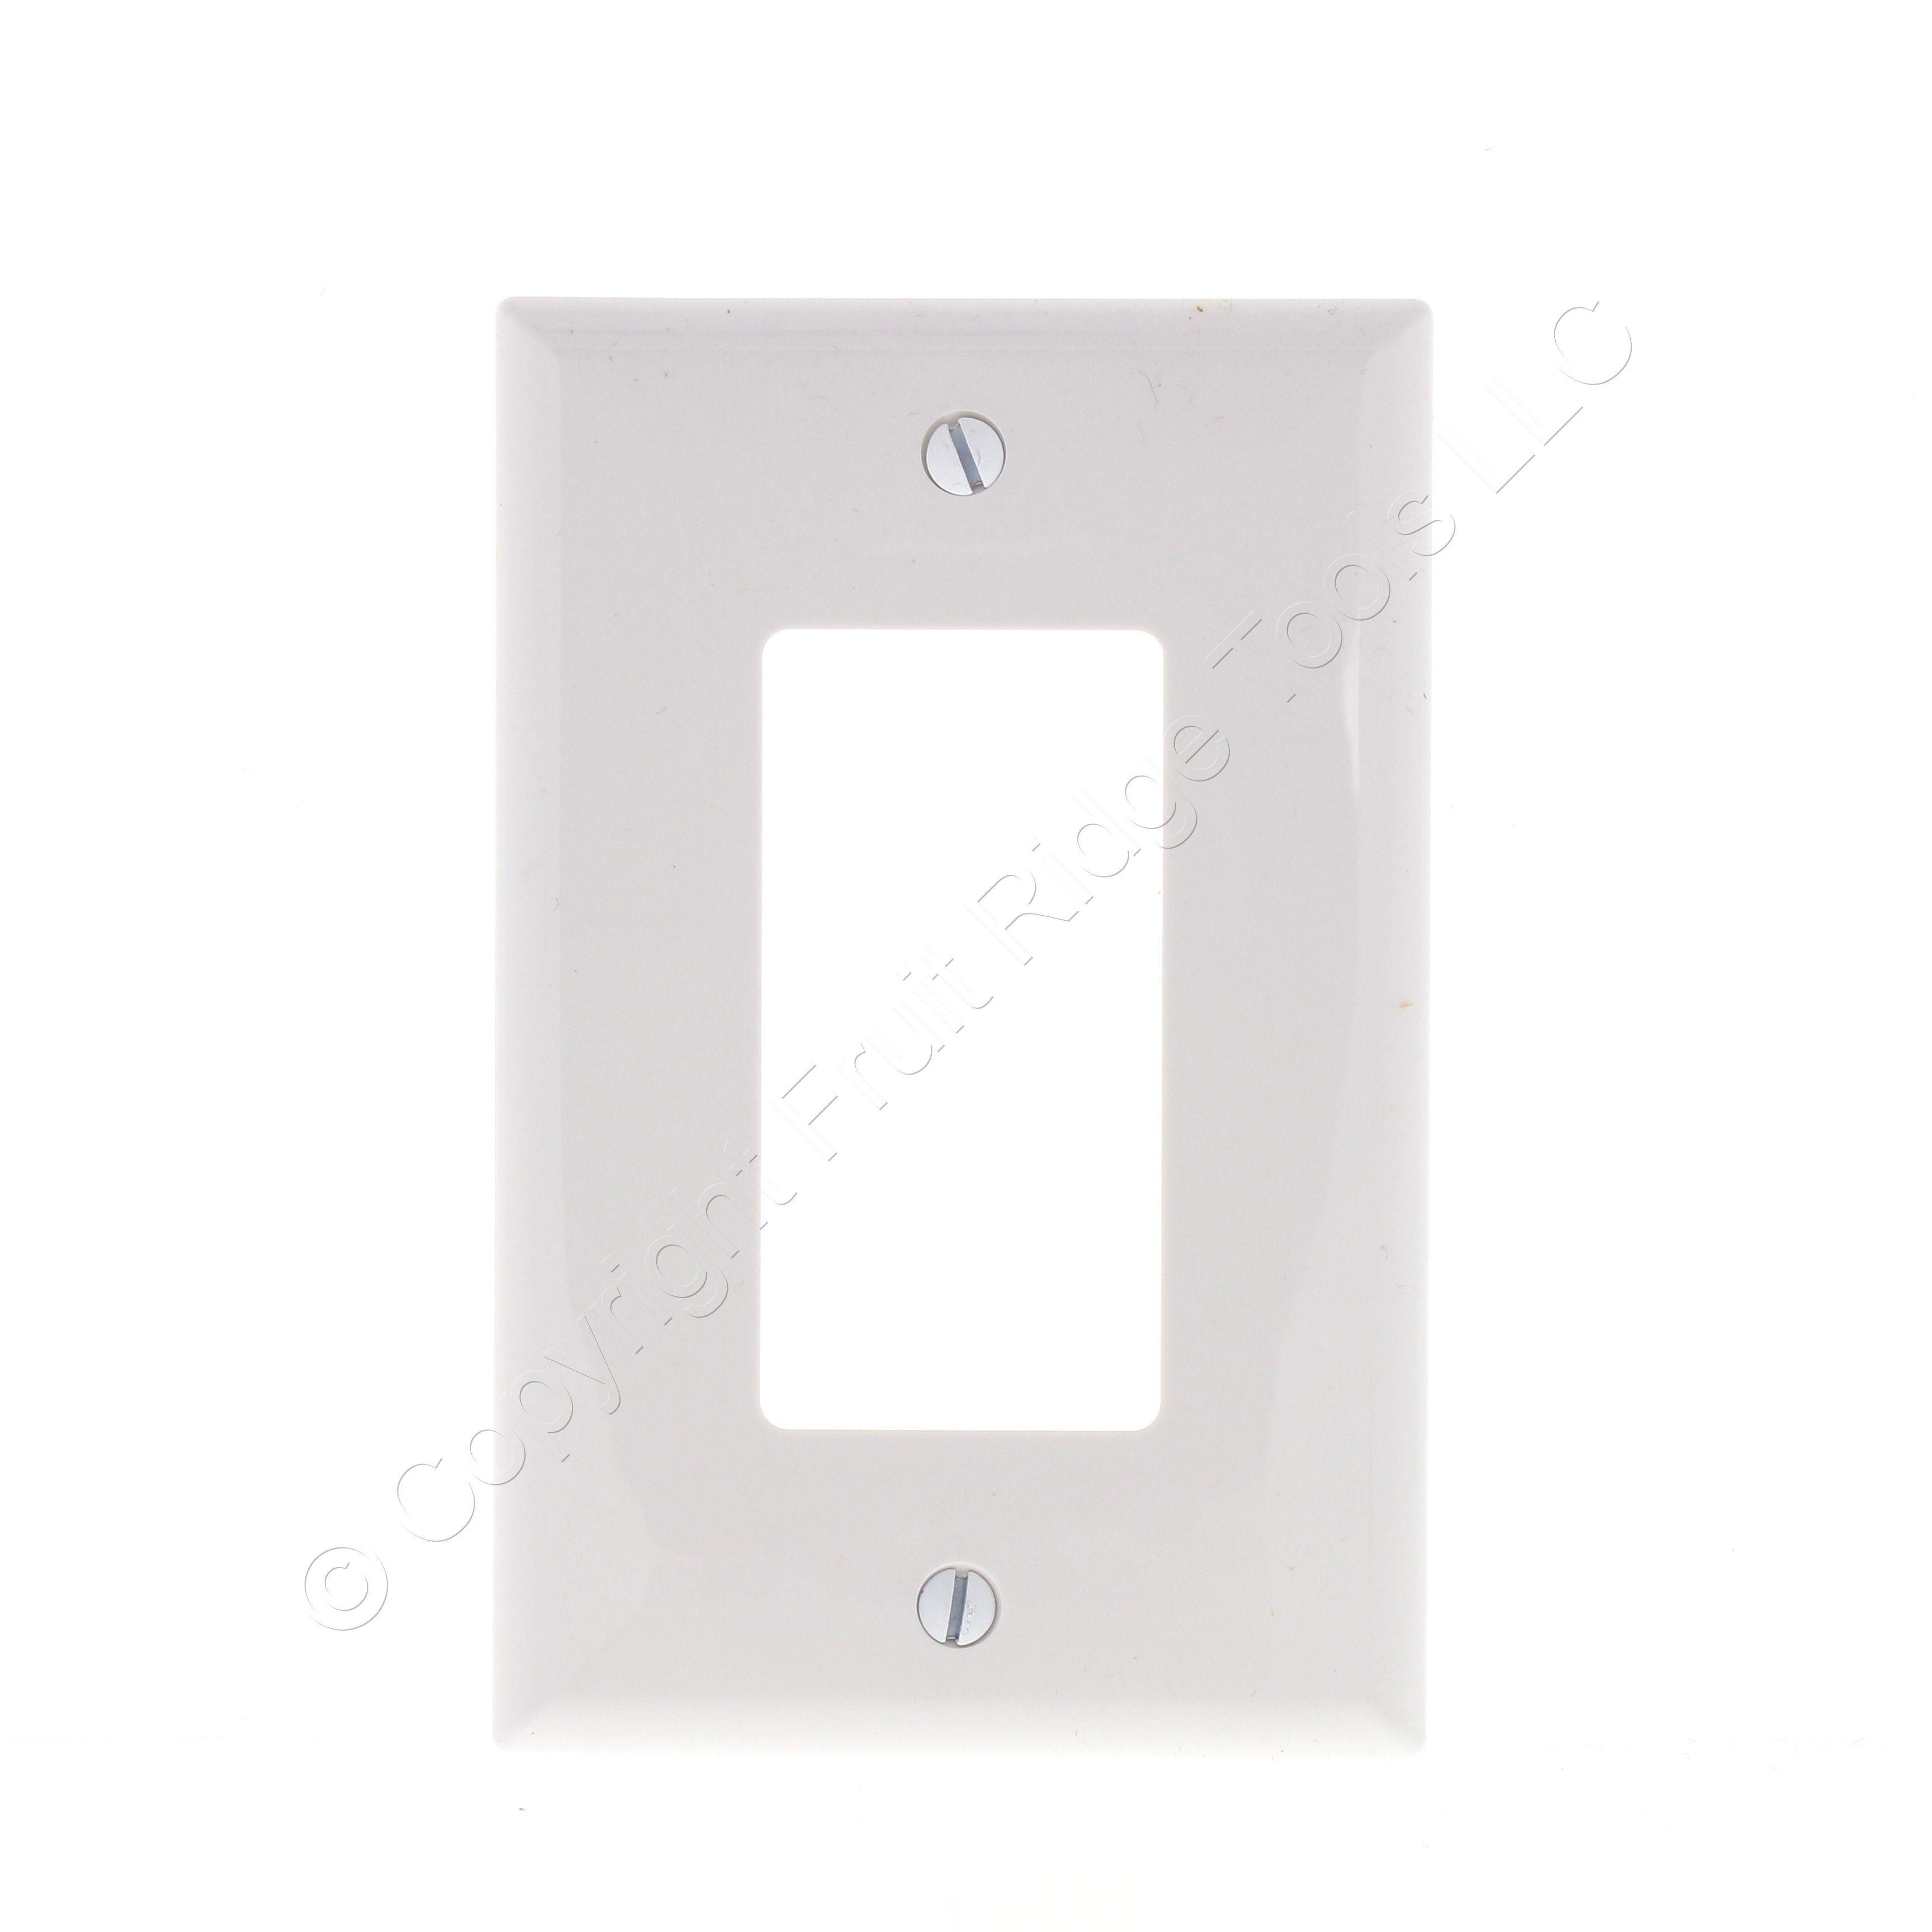 New Eaton White Decorator 1G UNBREAKABLE Mid-Size Wallplate